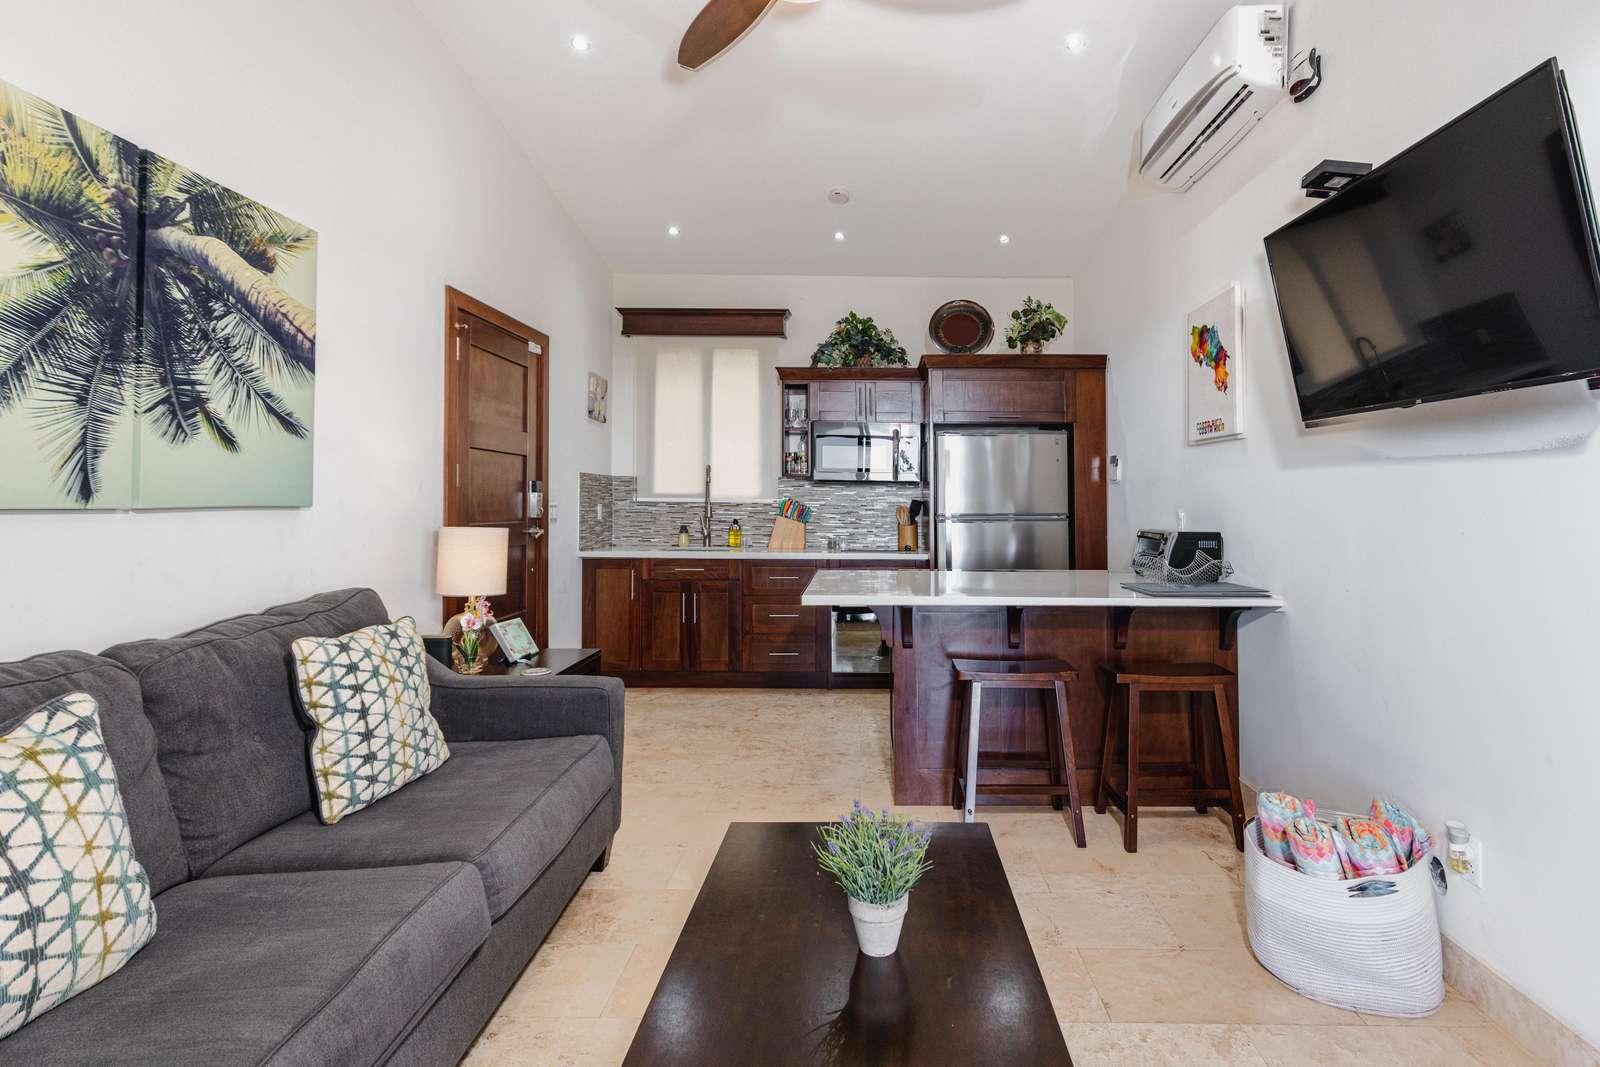 Spacious living area, kitchen, breakfast bar, Smart TV